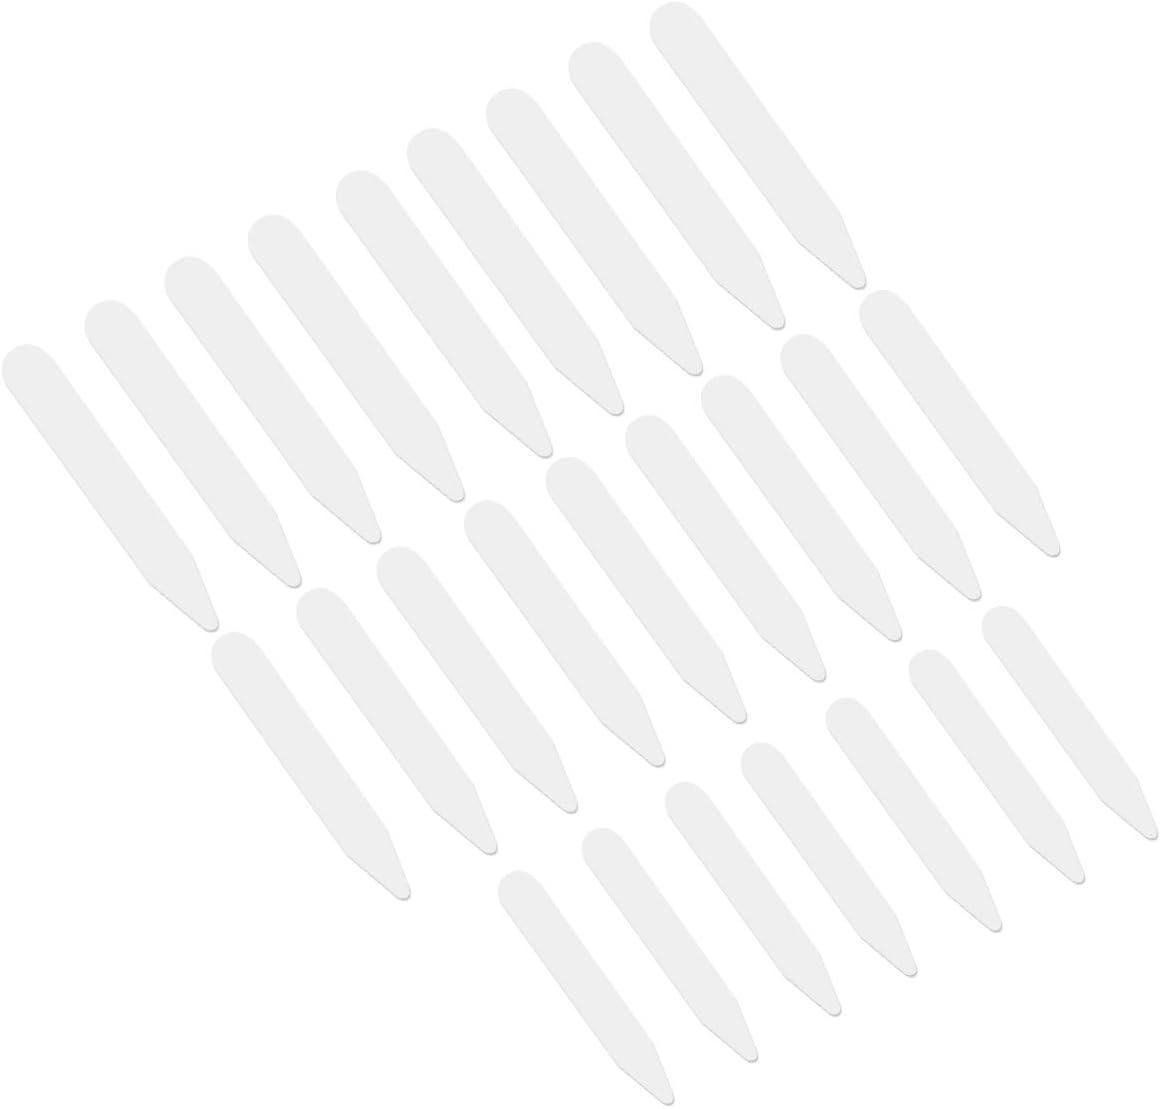 VORCOOL 200pcs Plastic Max 51% OFF Mail order White Collar Stays Bones Stiff Shirts for